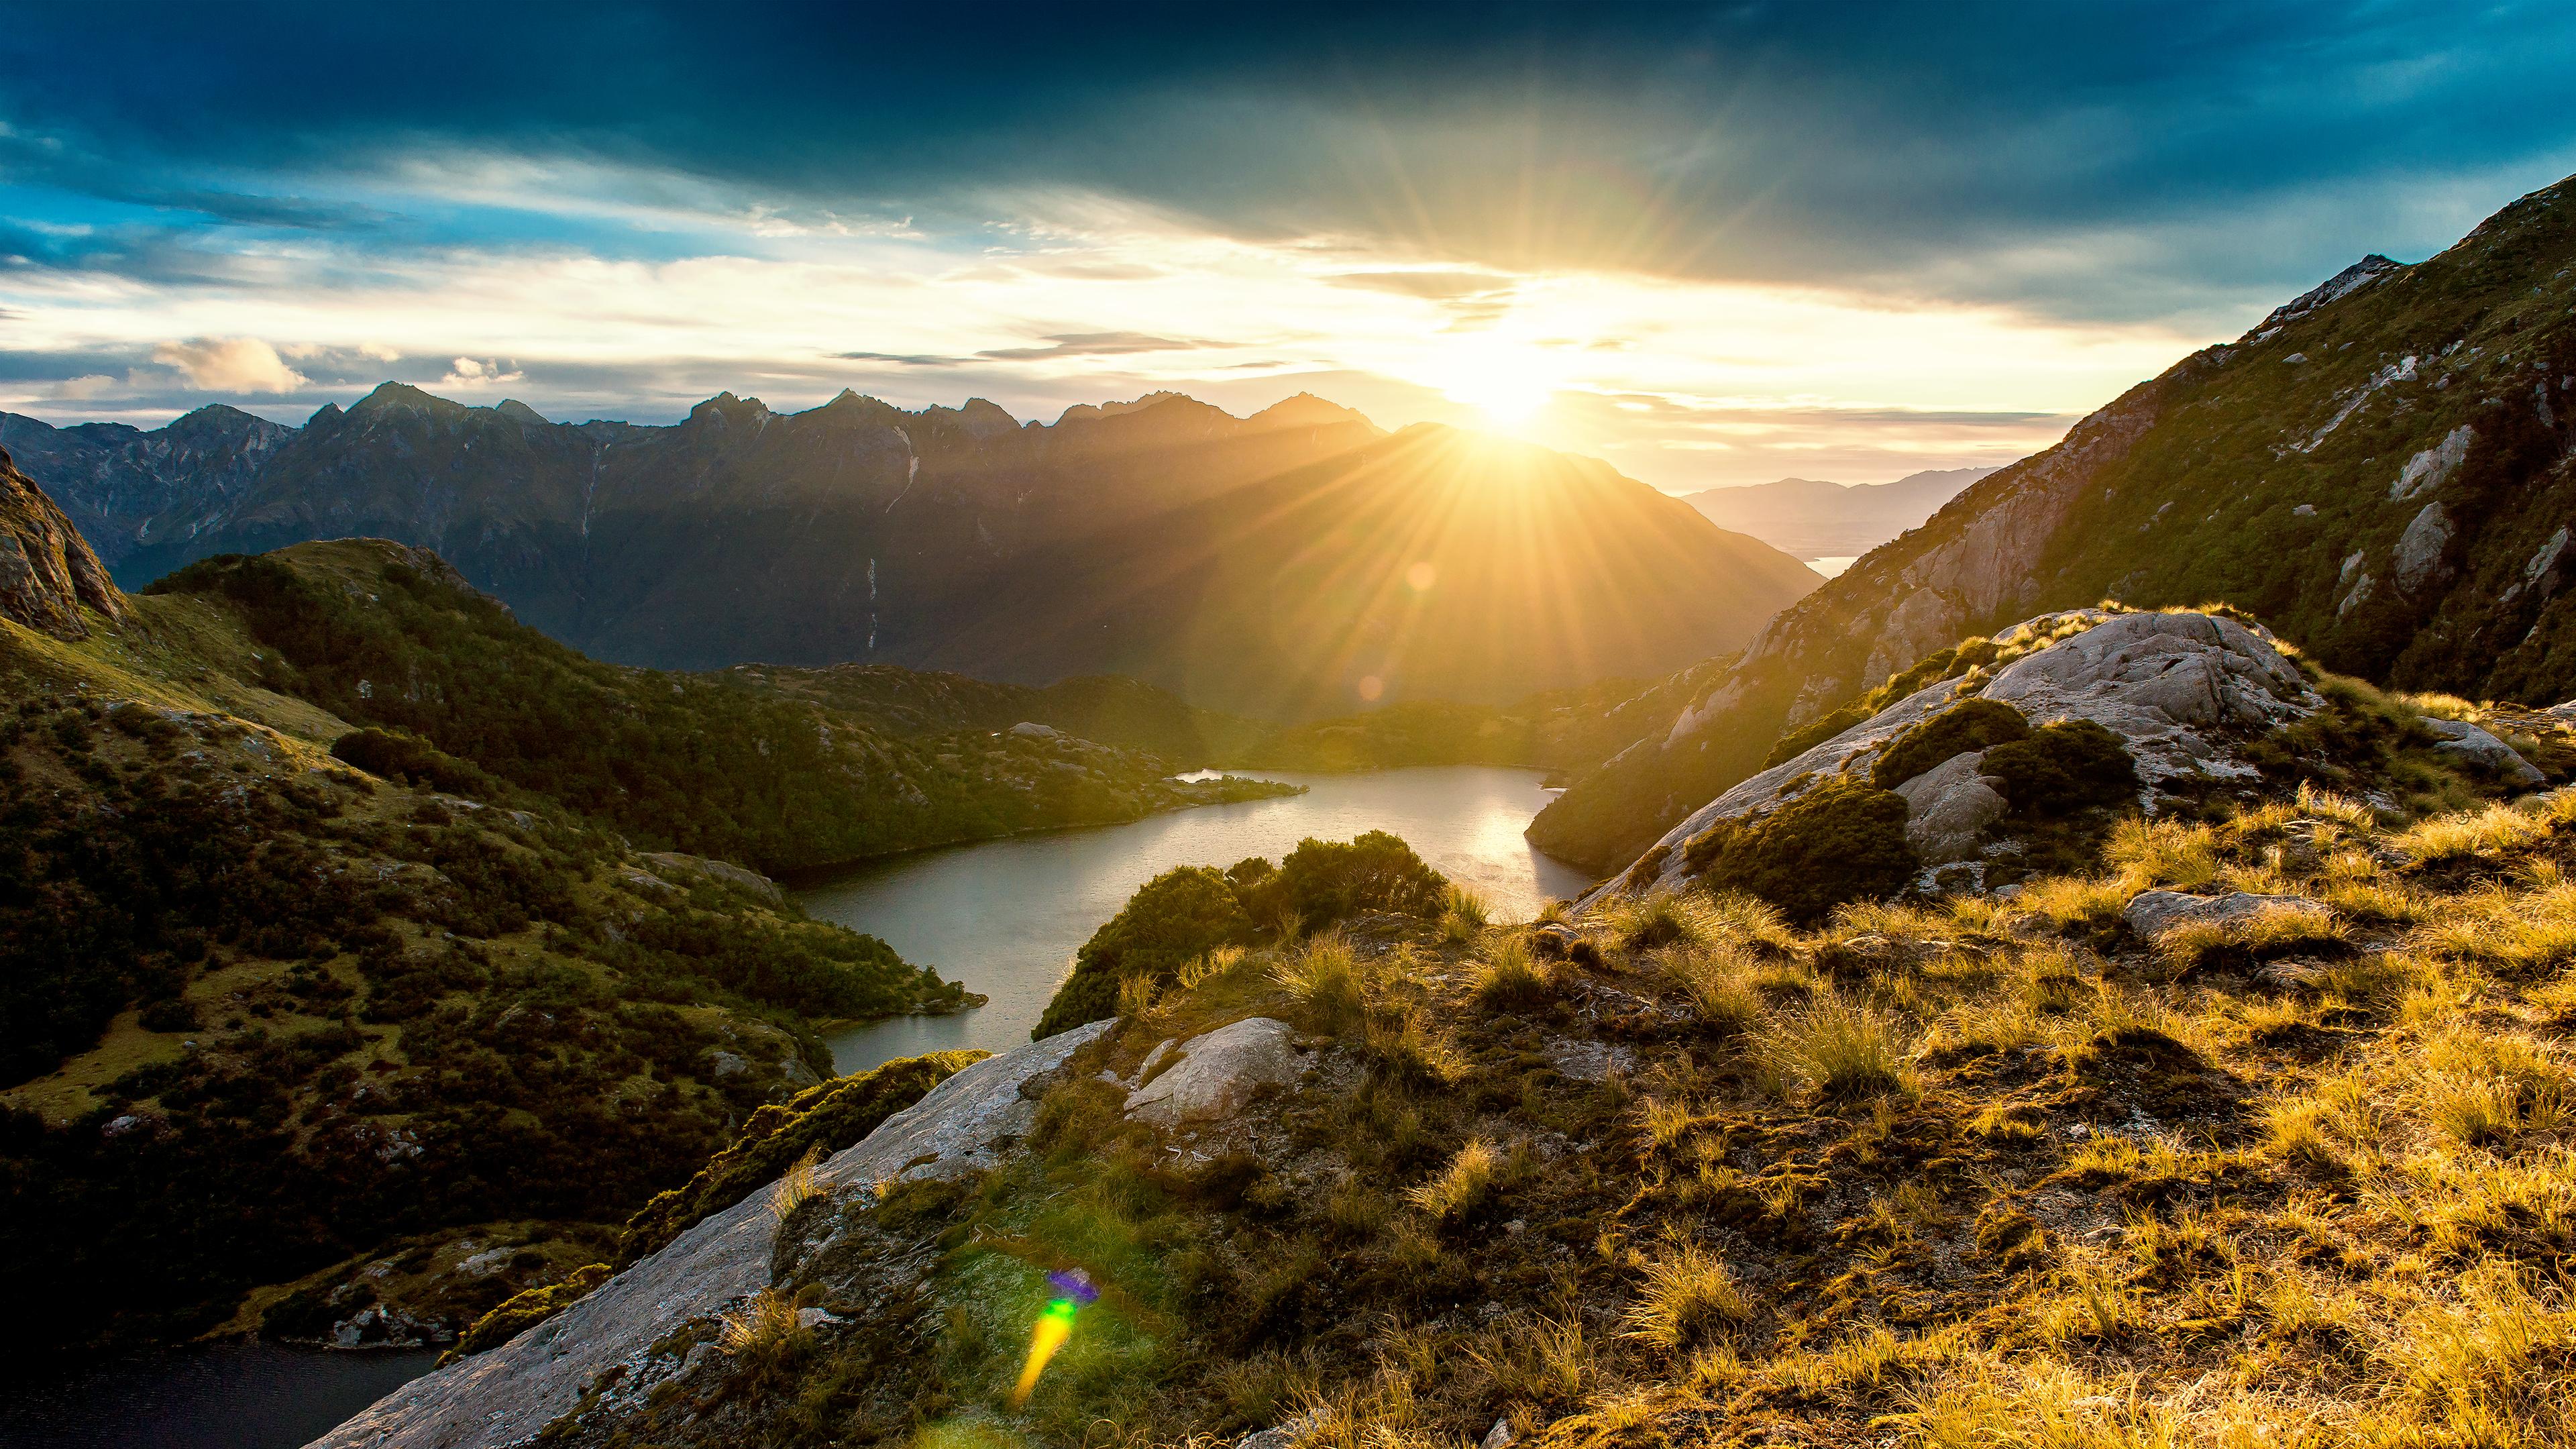 Fiordland Sunrise, hd walepaper, free wallpaper